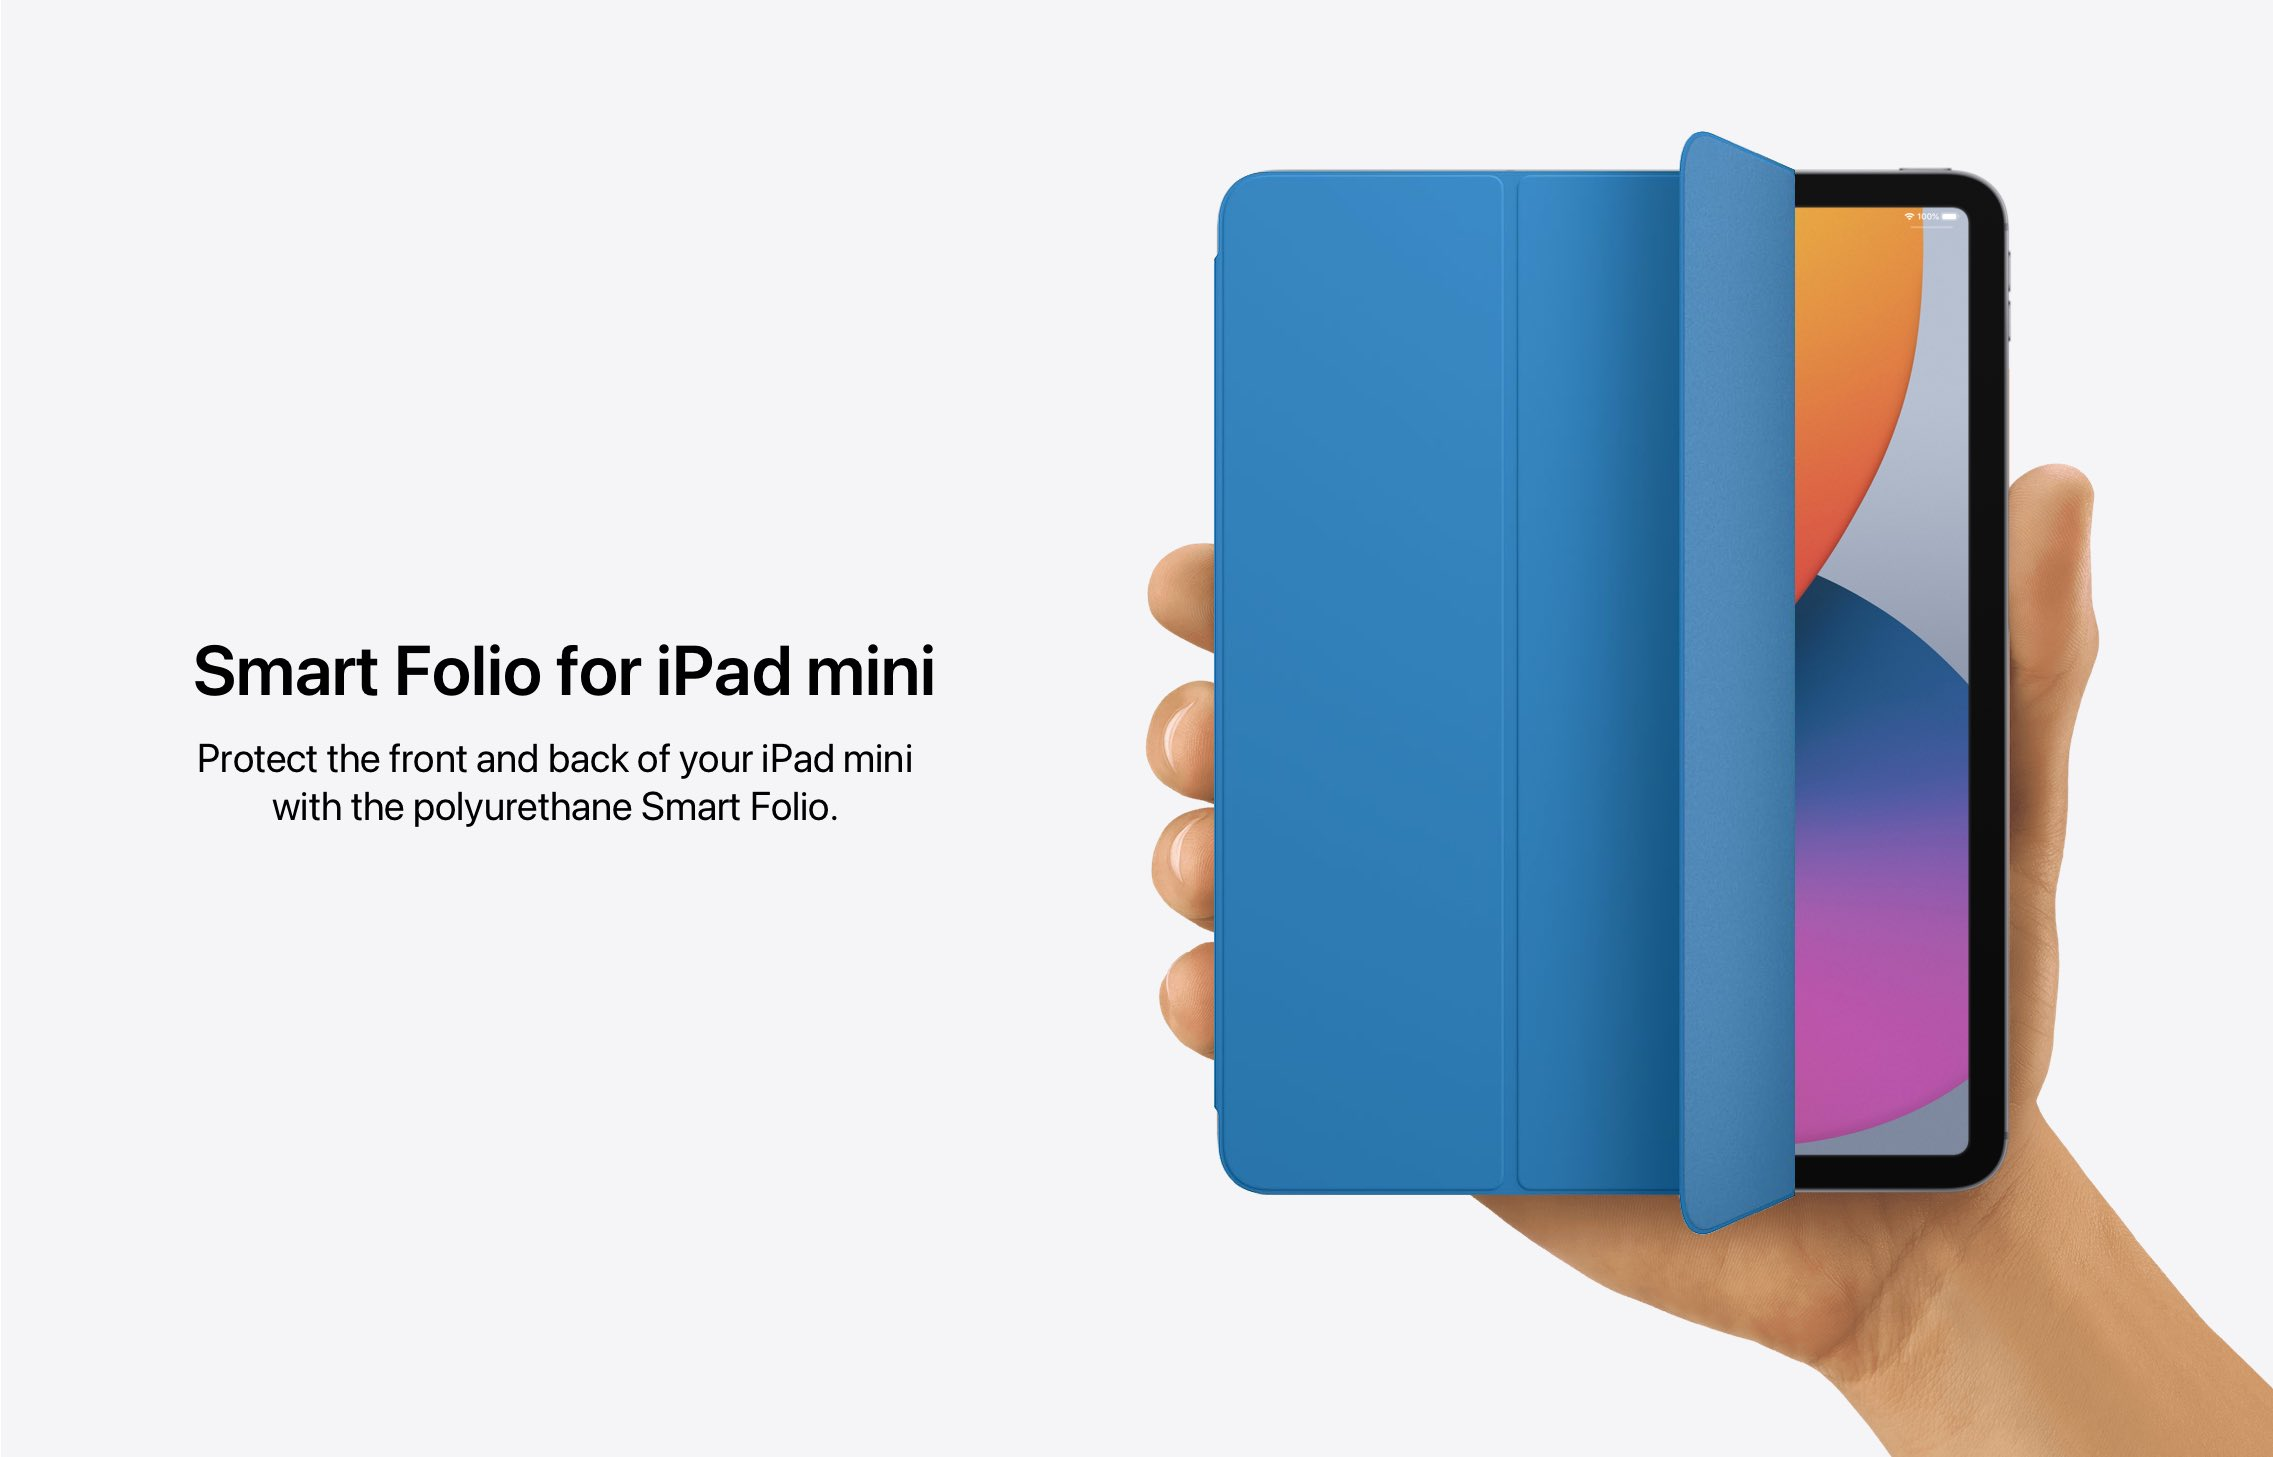 Conceito: Smart Folio para iPad mini